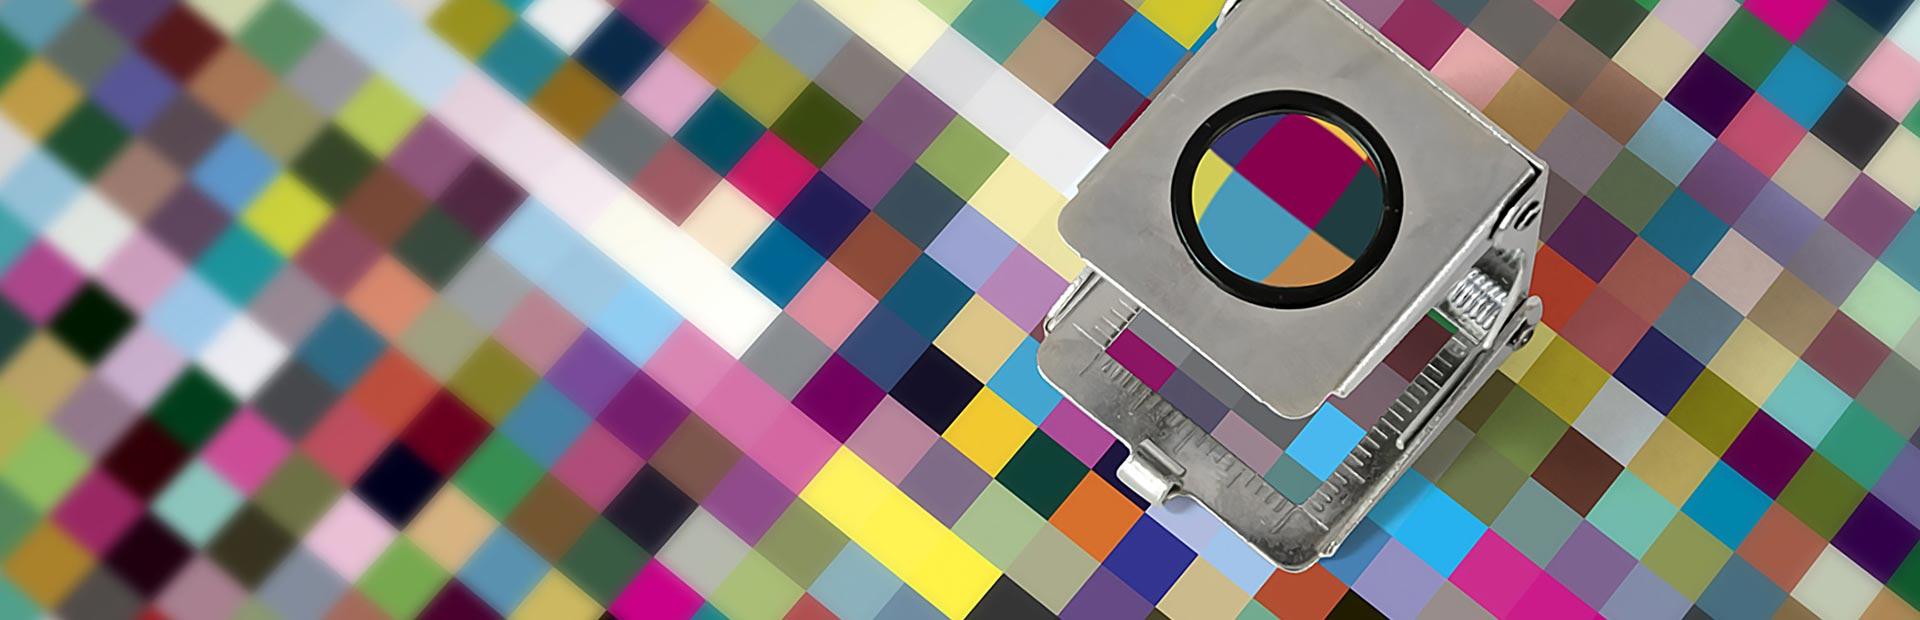 xhomebanner-colorflo-squares